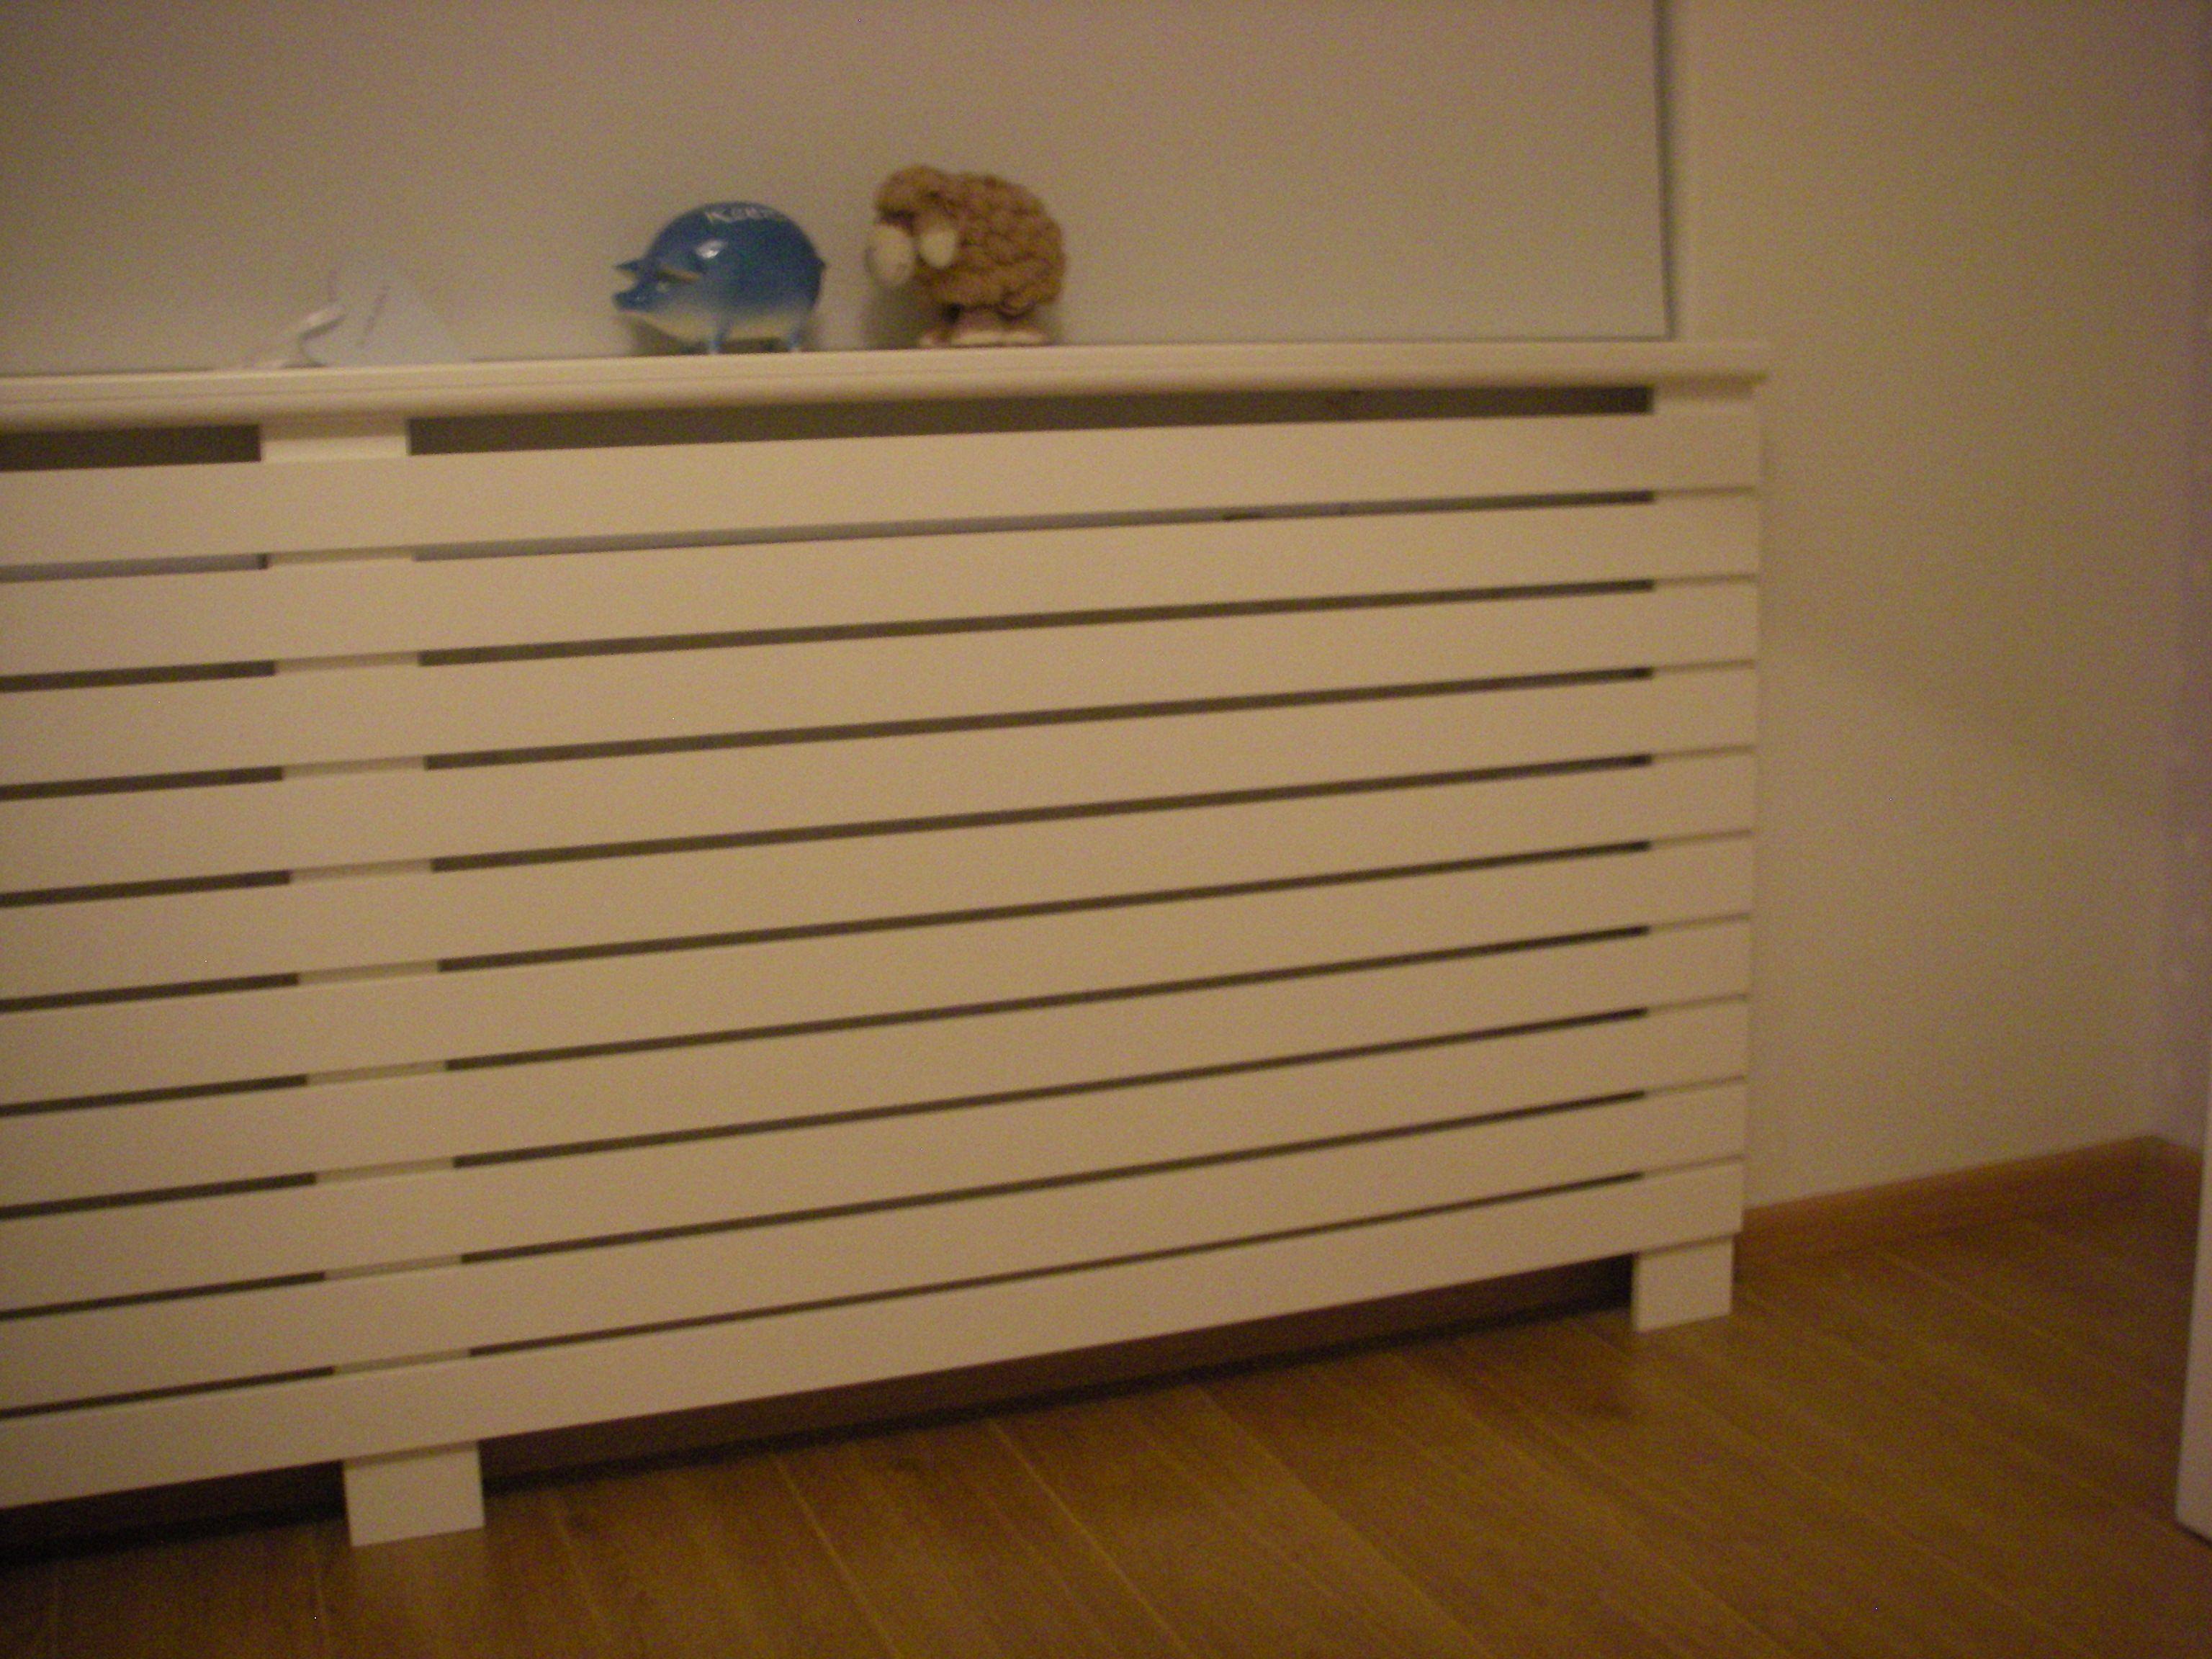 Radiator Slaapkamer Meubels : Radiator ombouw slaapkamer zoontje made by me